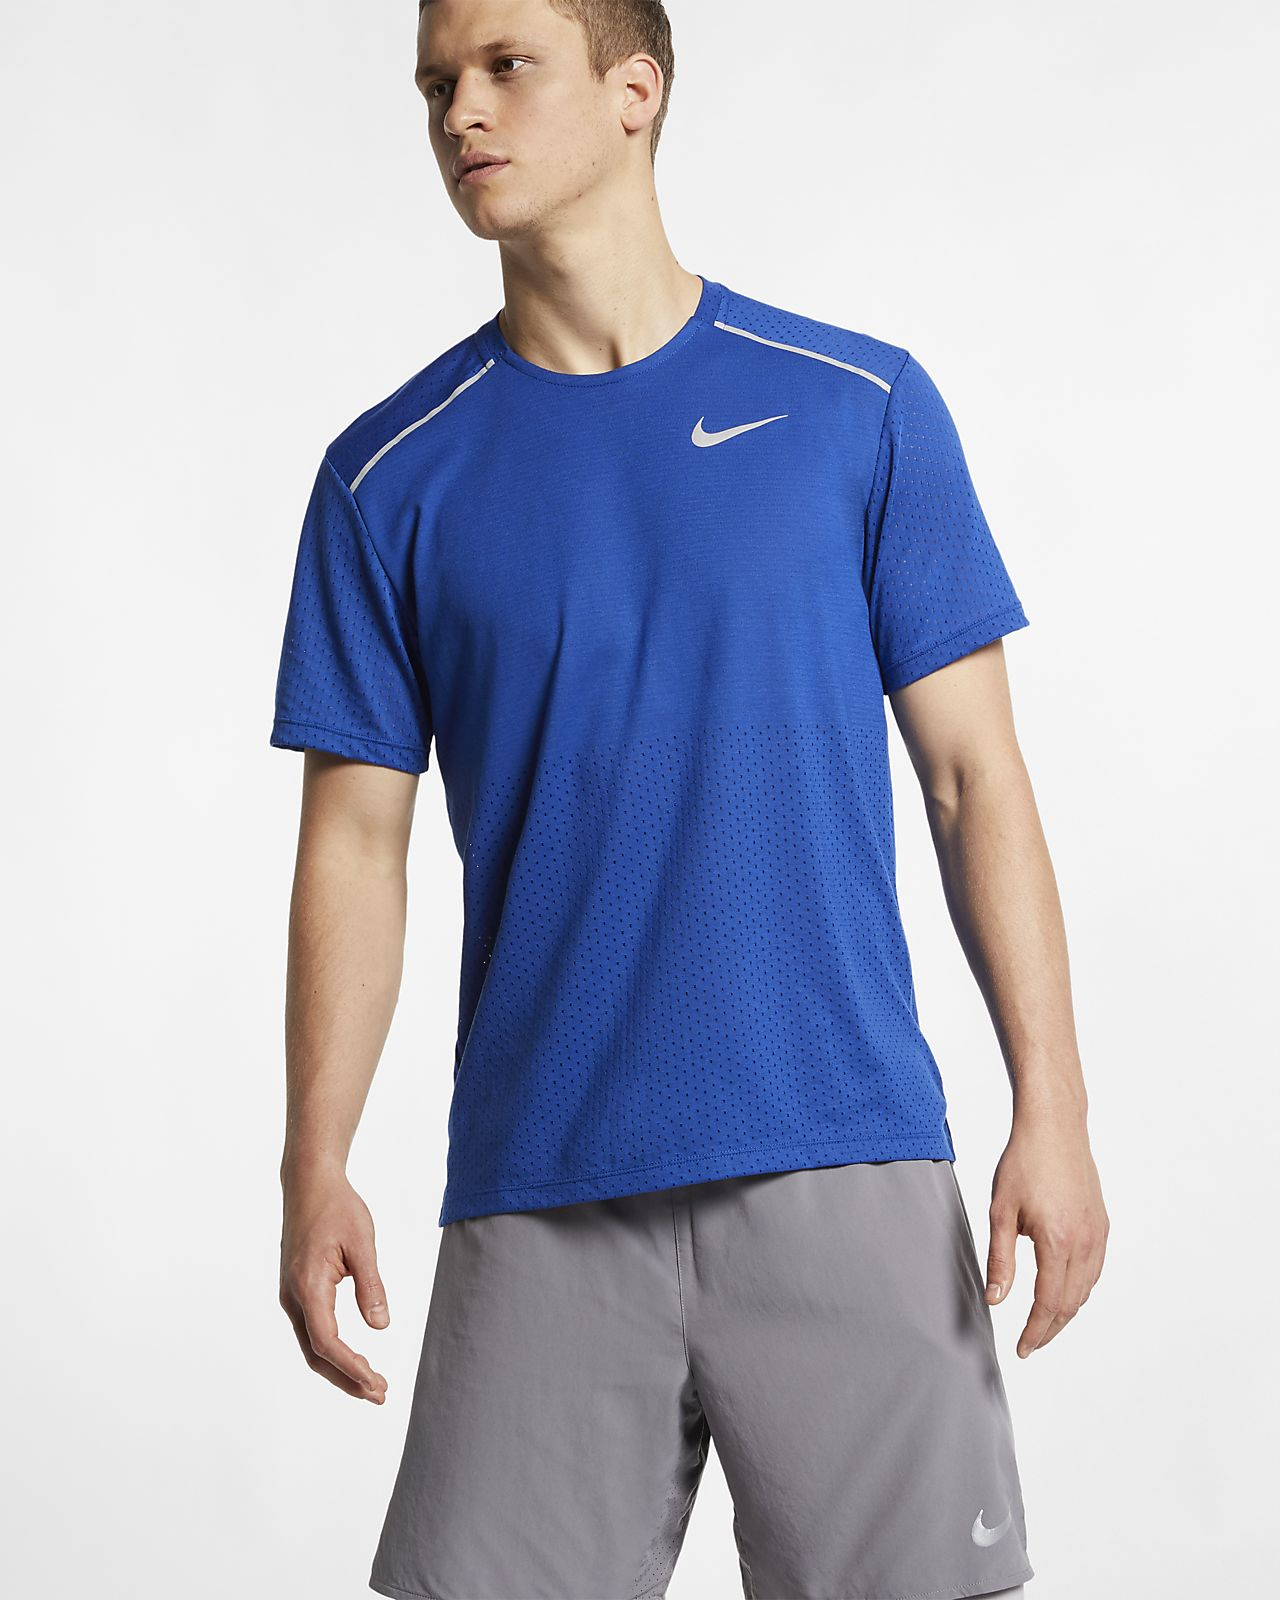 Prenda para la parte superior de running de manga corta para hombre Nike Rise 365